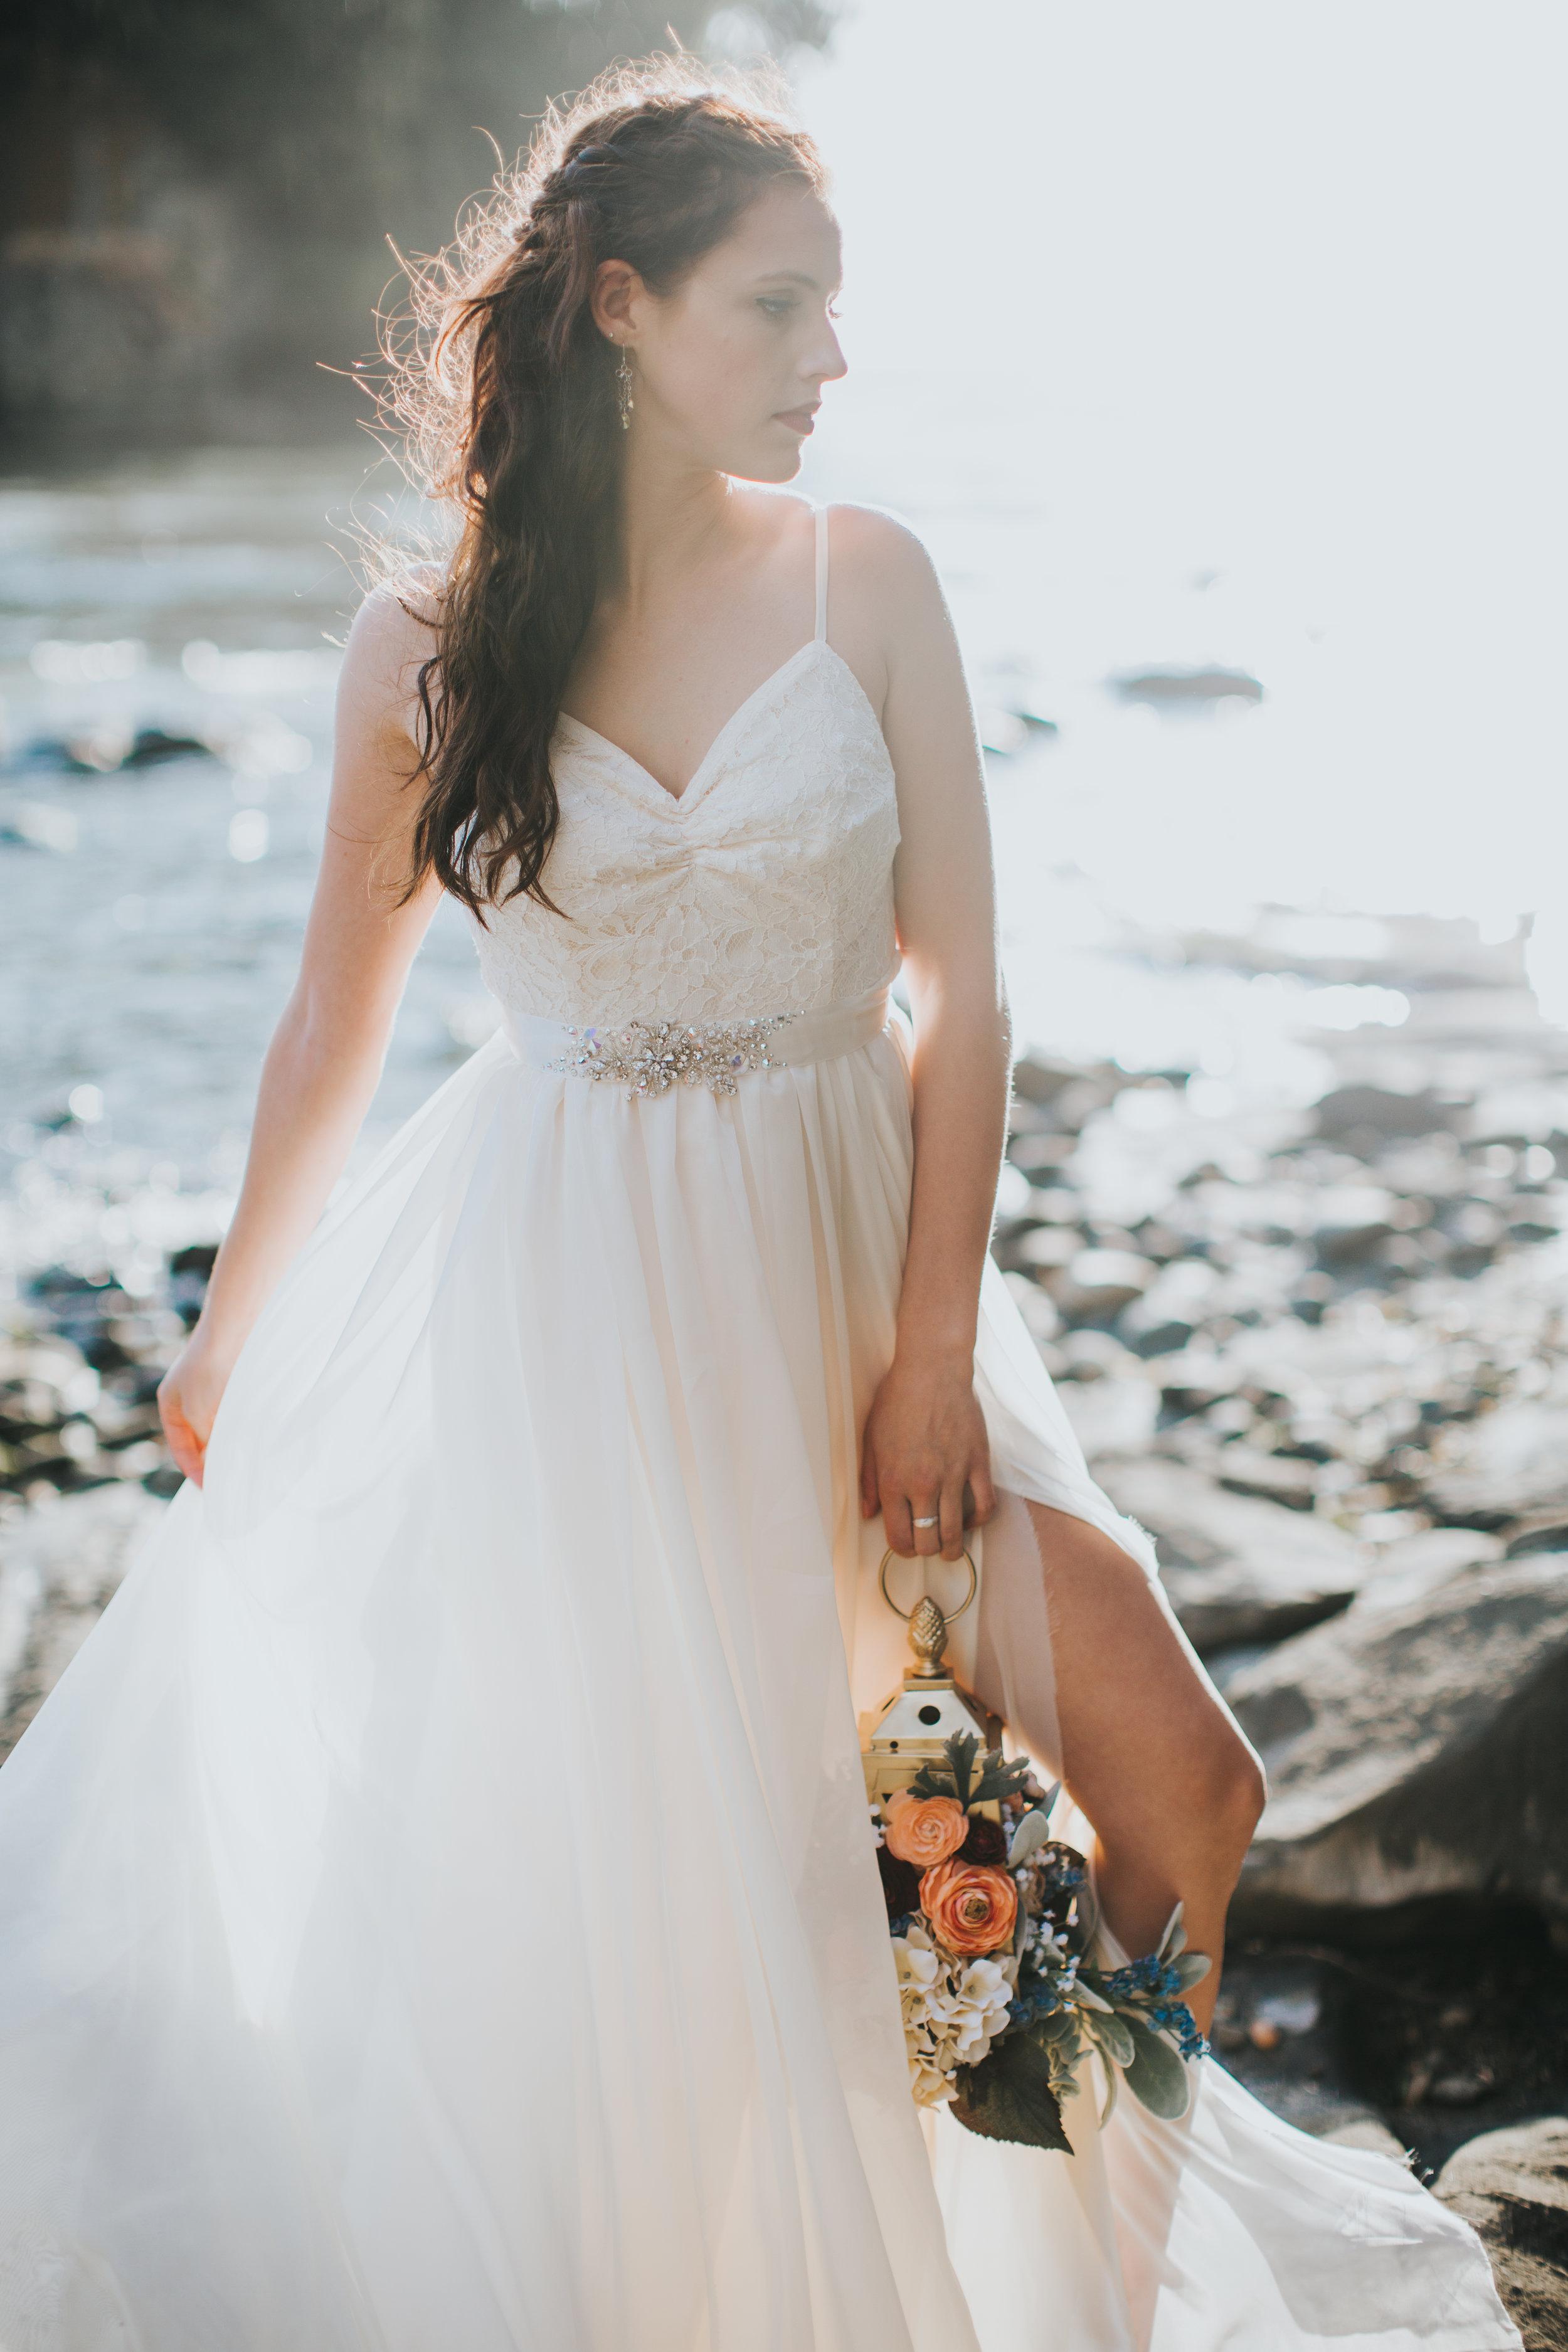 Port-Angeles-Salt-Creek-beach-wedding-bride-PNW-olympic-peninsula-photographer-Kayla-Dawn-Photography-outdoors-golden-hour-dancer-dress (6).jpg